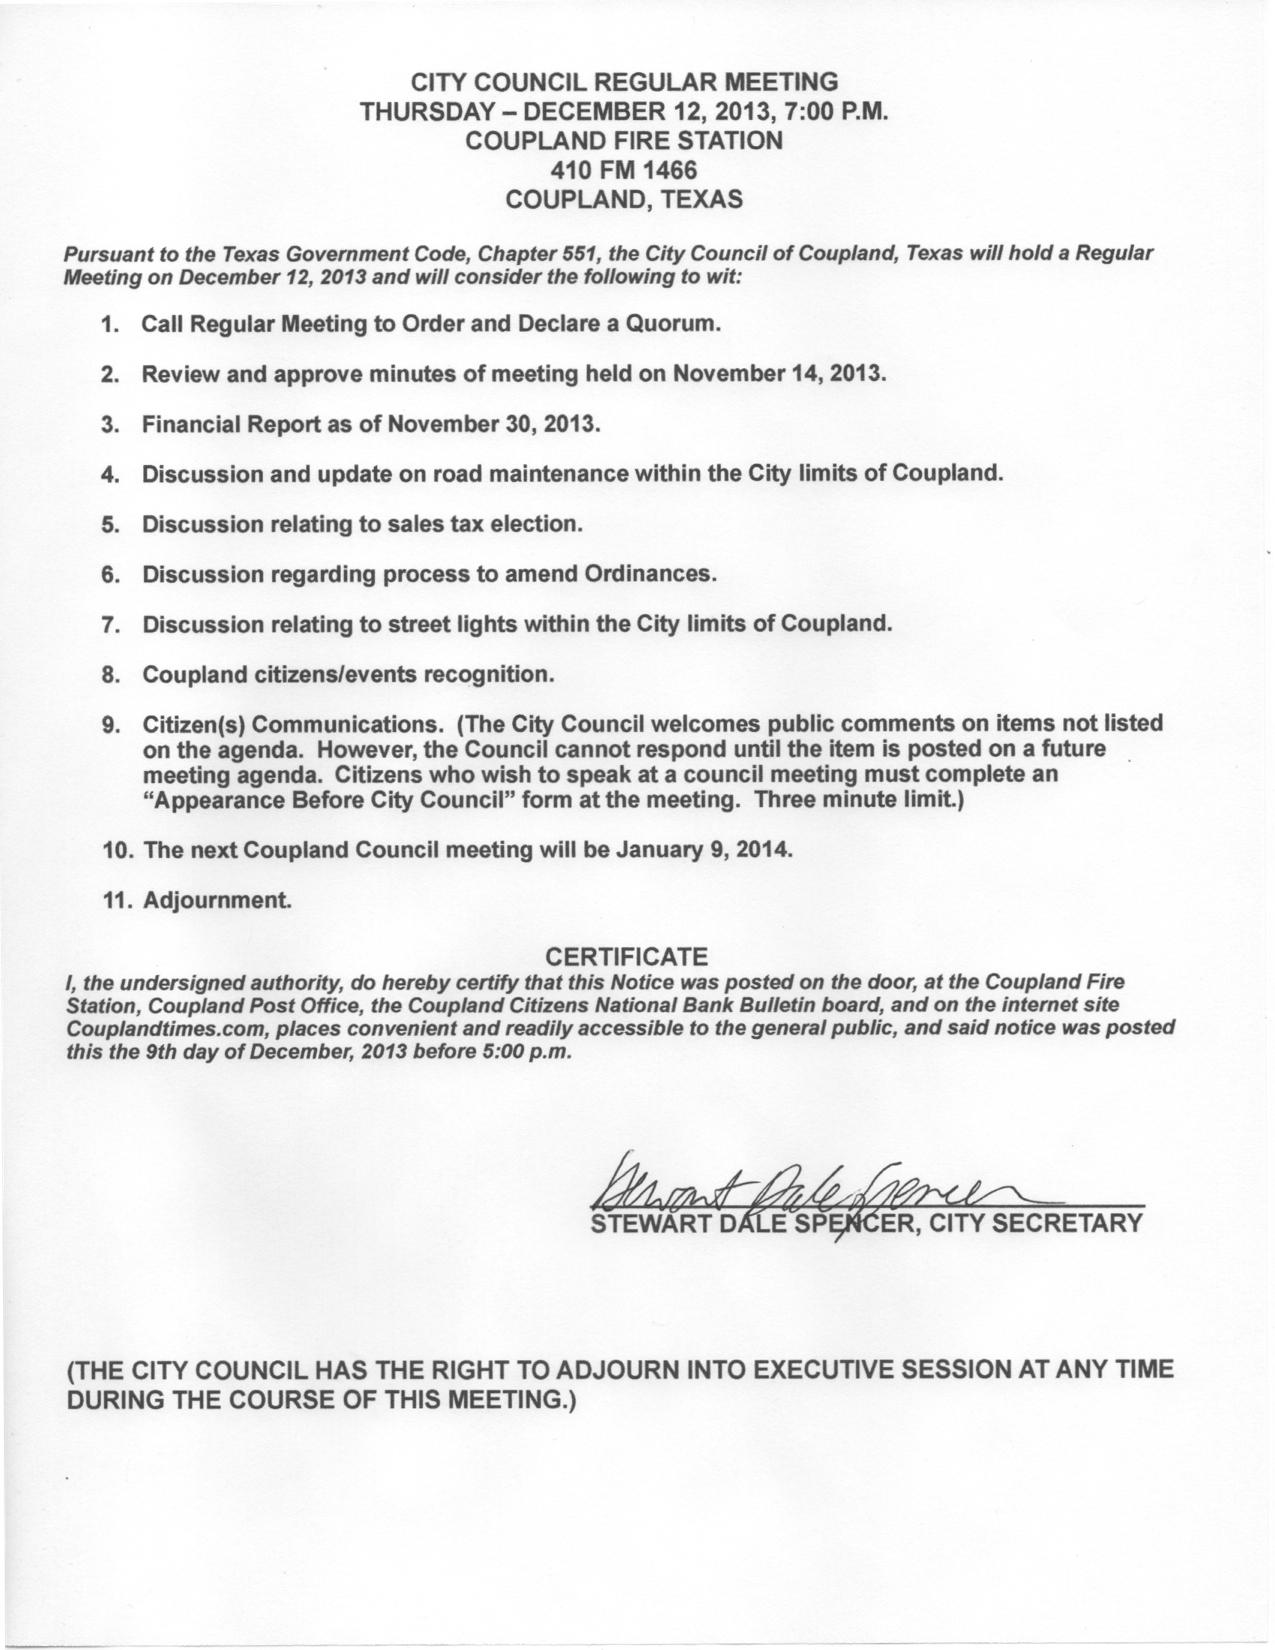 Regular Meeting Agenda, Dec. 12, 2013